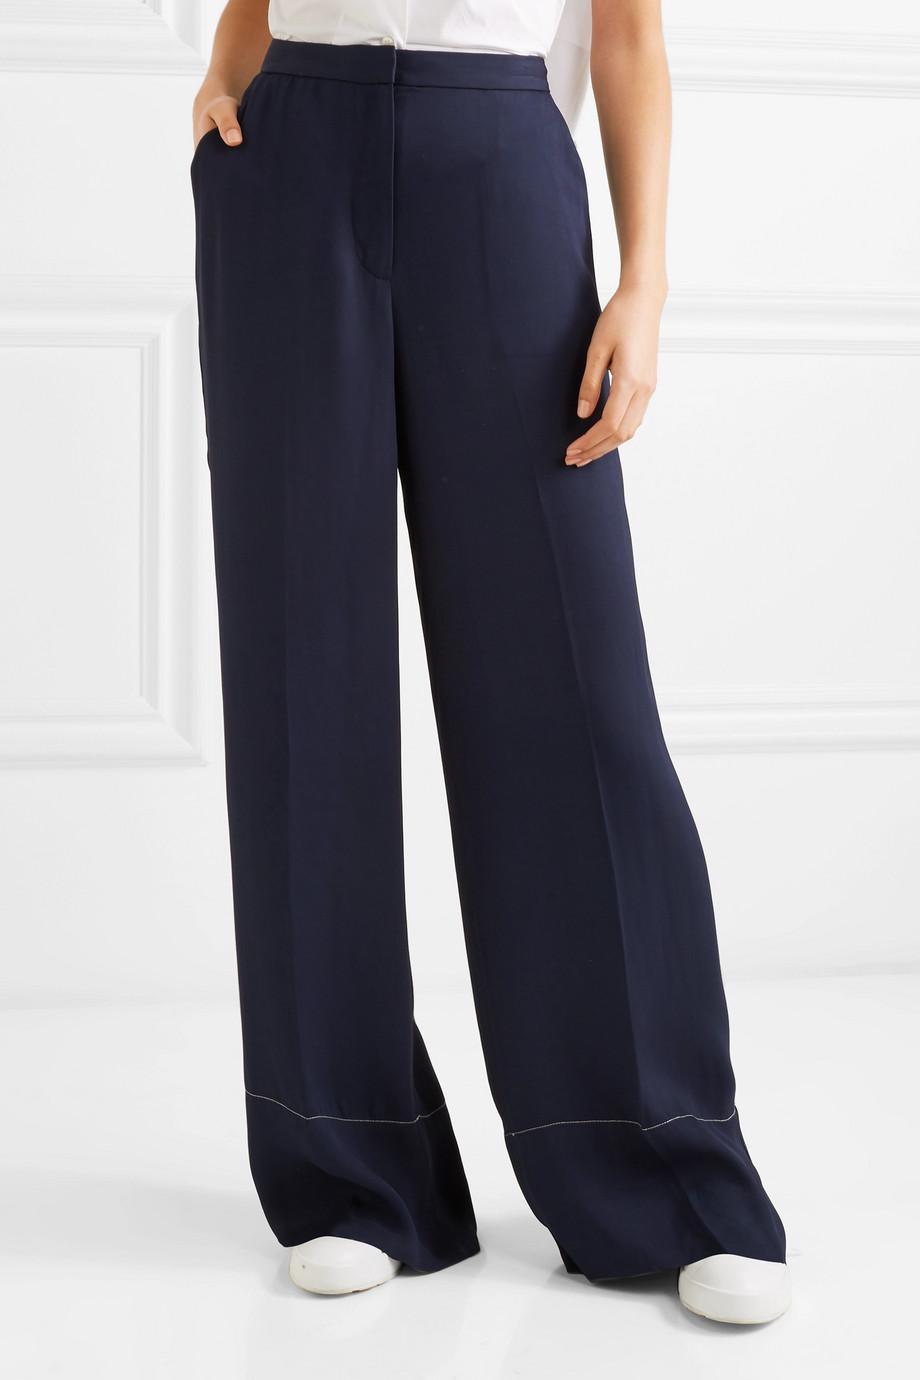 Harmon Crepe Wide-leg Pants - Navy Elizabeth & James uLJrCqrMjm